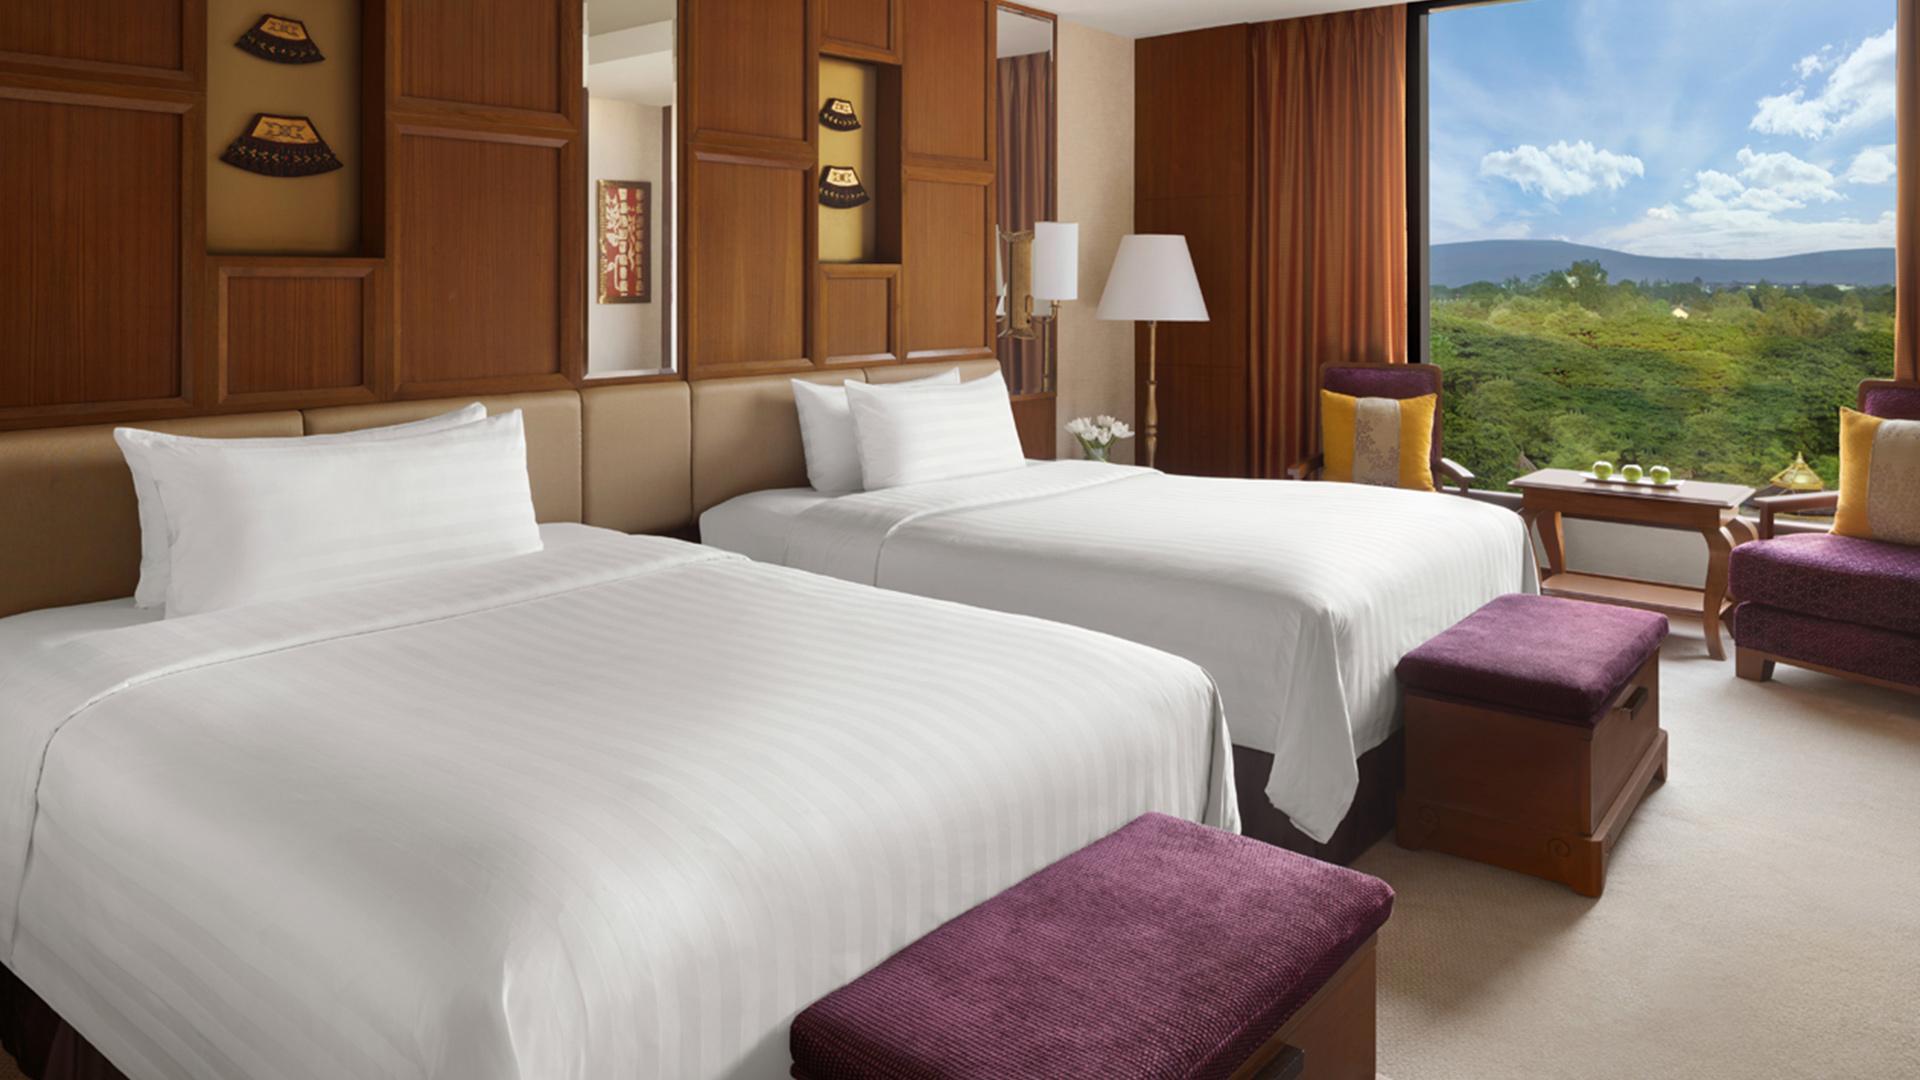 Deluxe Pool View King/Twin Room image 1 at Shangri-La Hotel, Chiang Mai by Amphoe Mueang Chiang Mai, Chang Wat Chiang Mai, Thailand